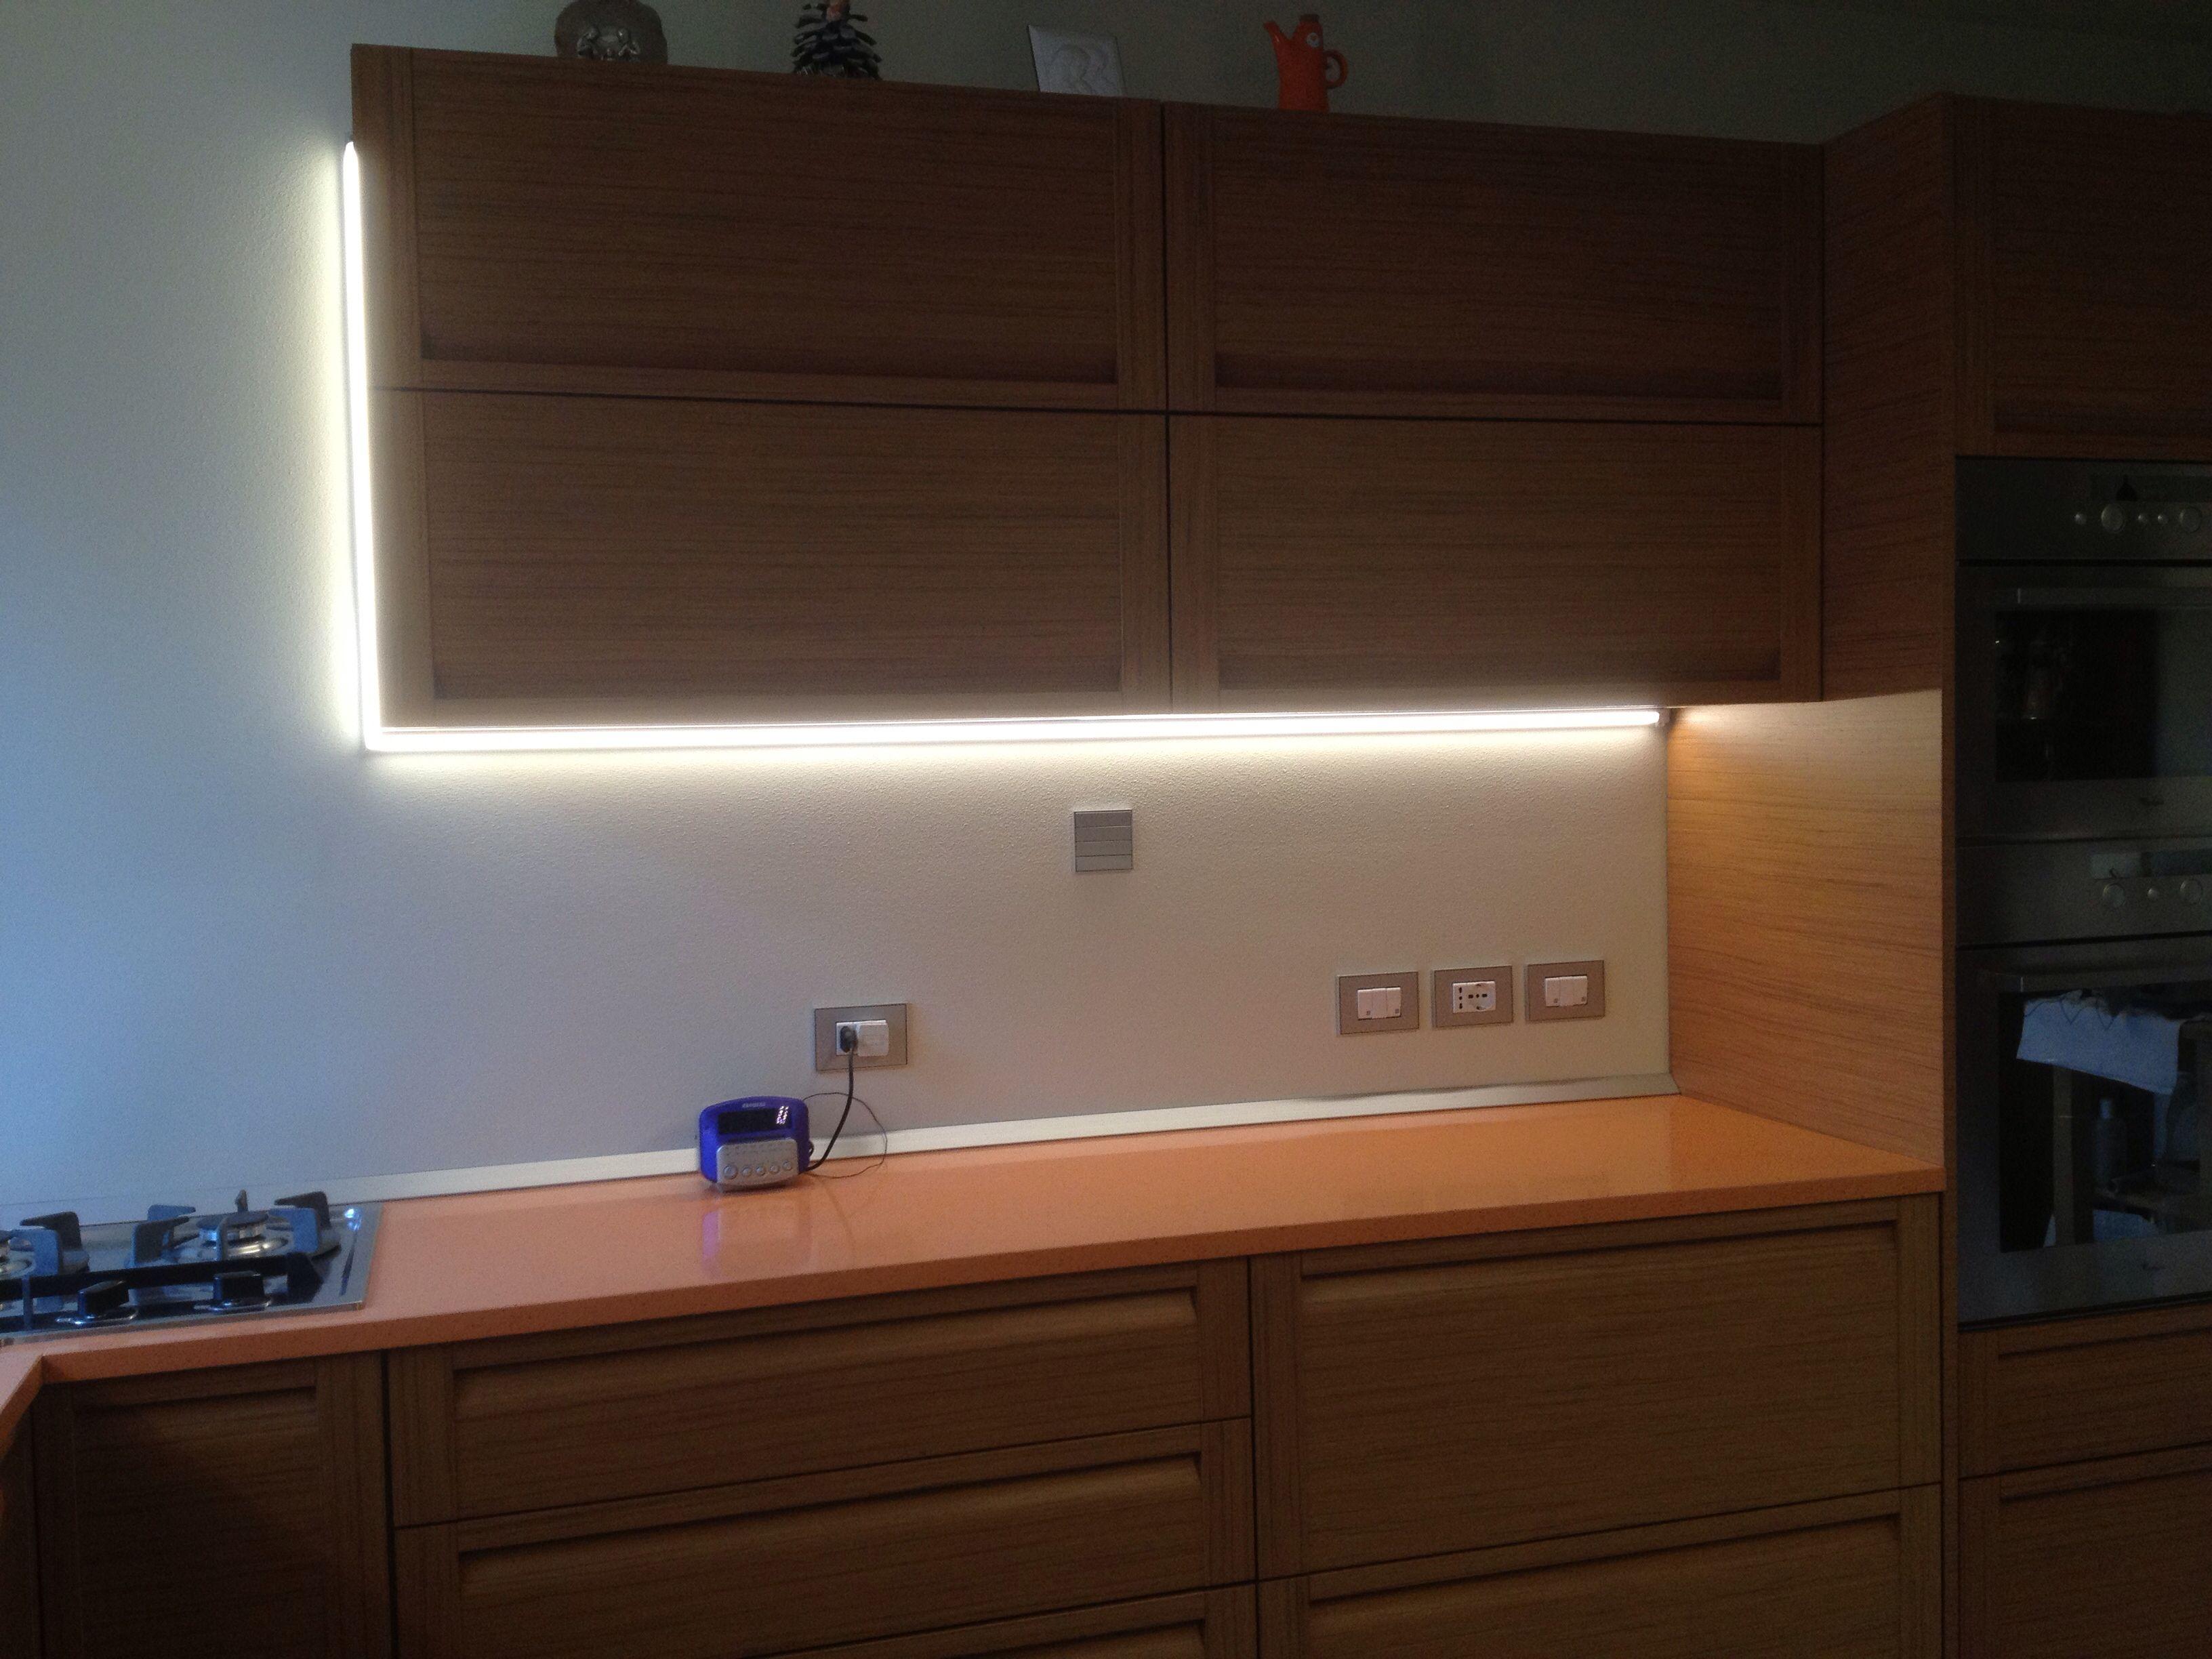 Luce a LED di supporto per mobili in cucina!   Lampade LED   Pinterest